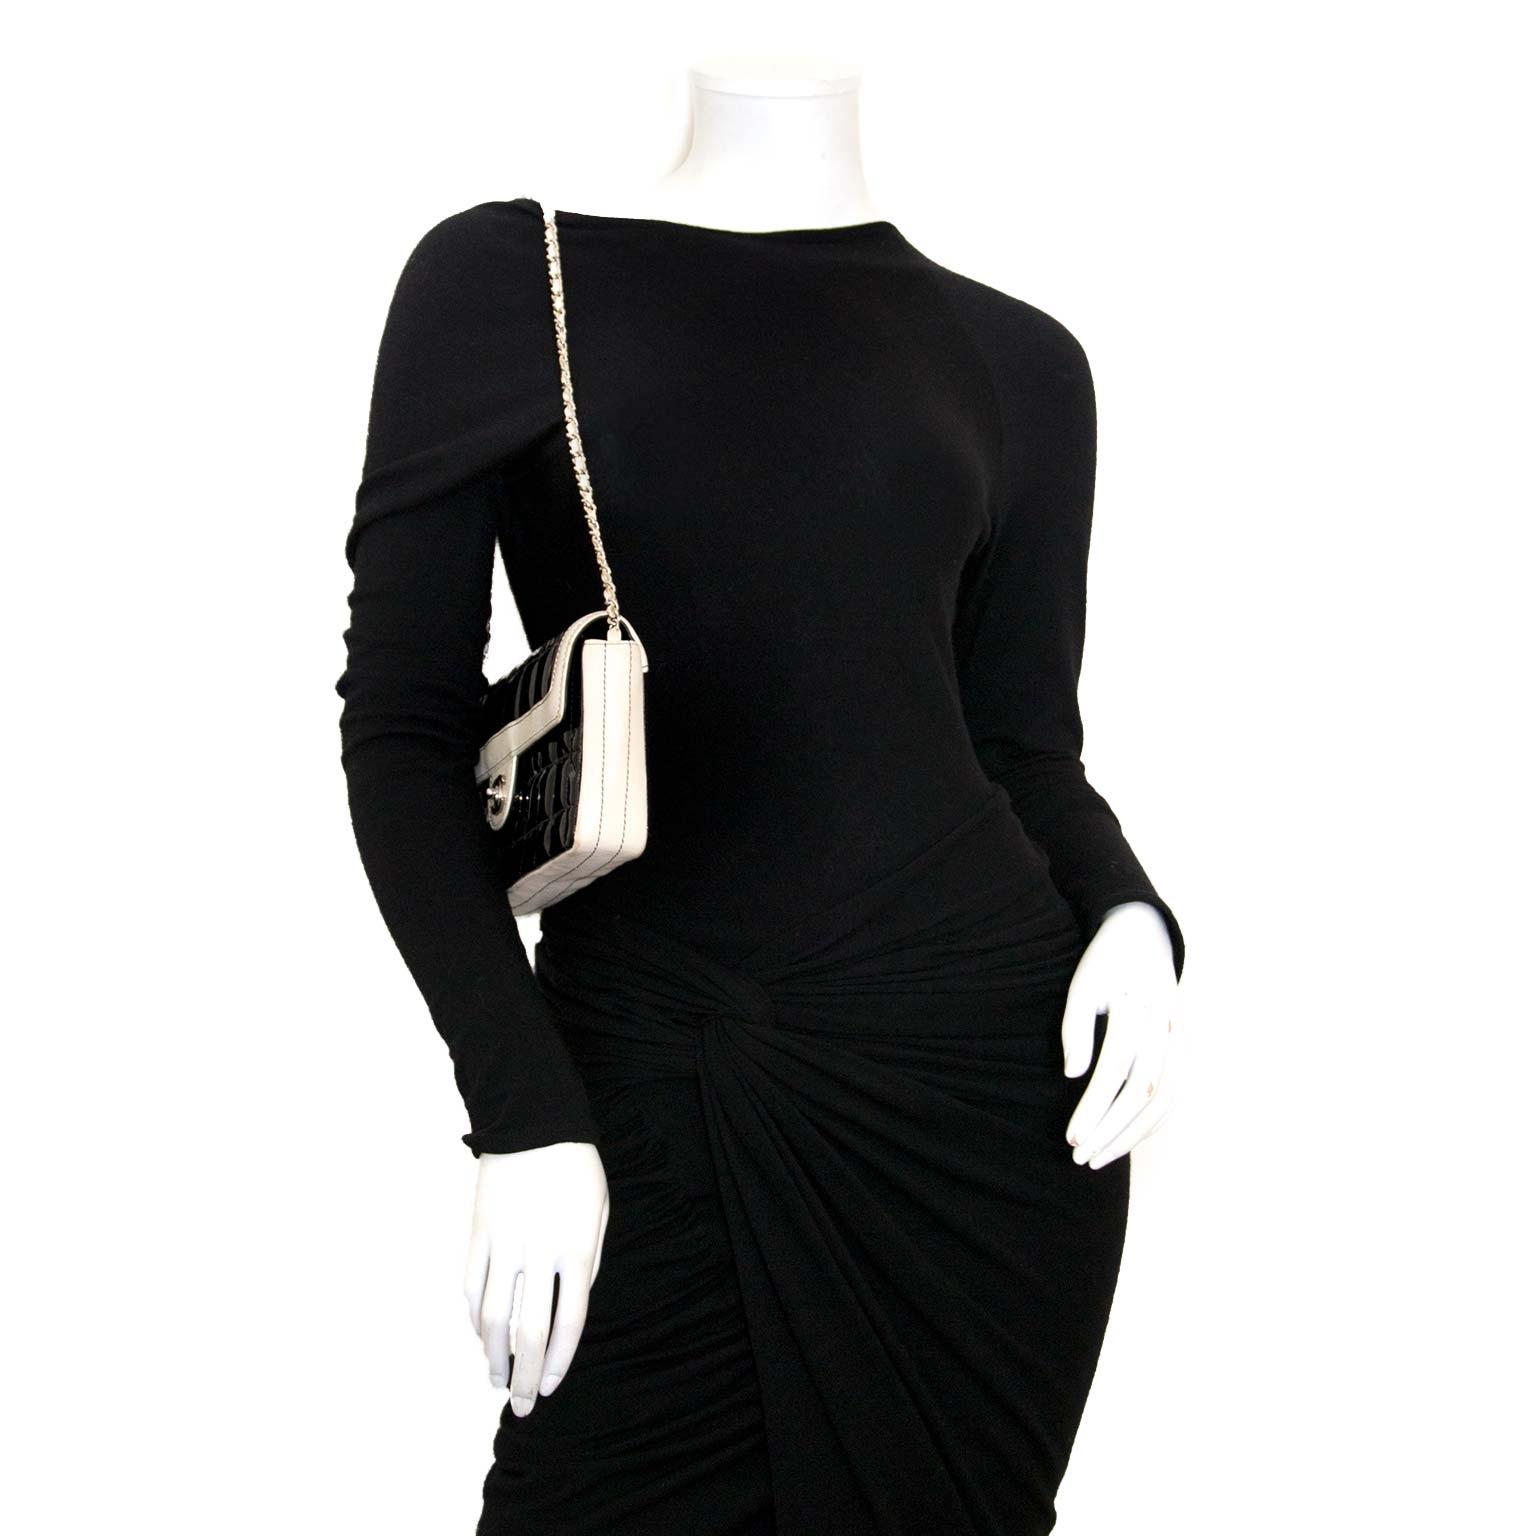 Chanel Black Patent Cube Shoulder Bag te koop